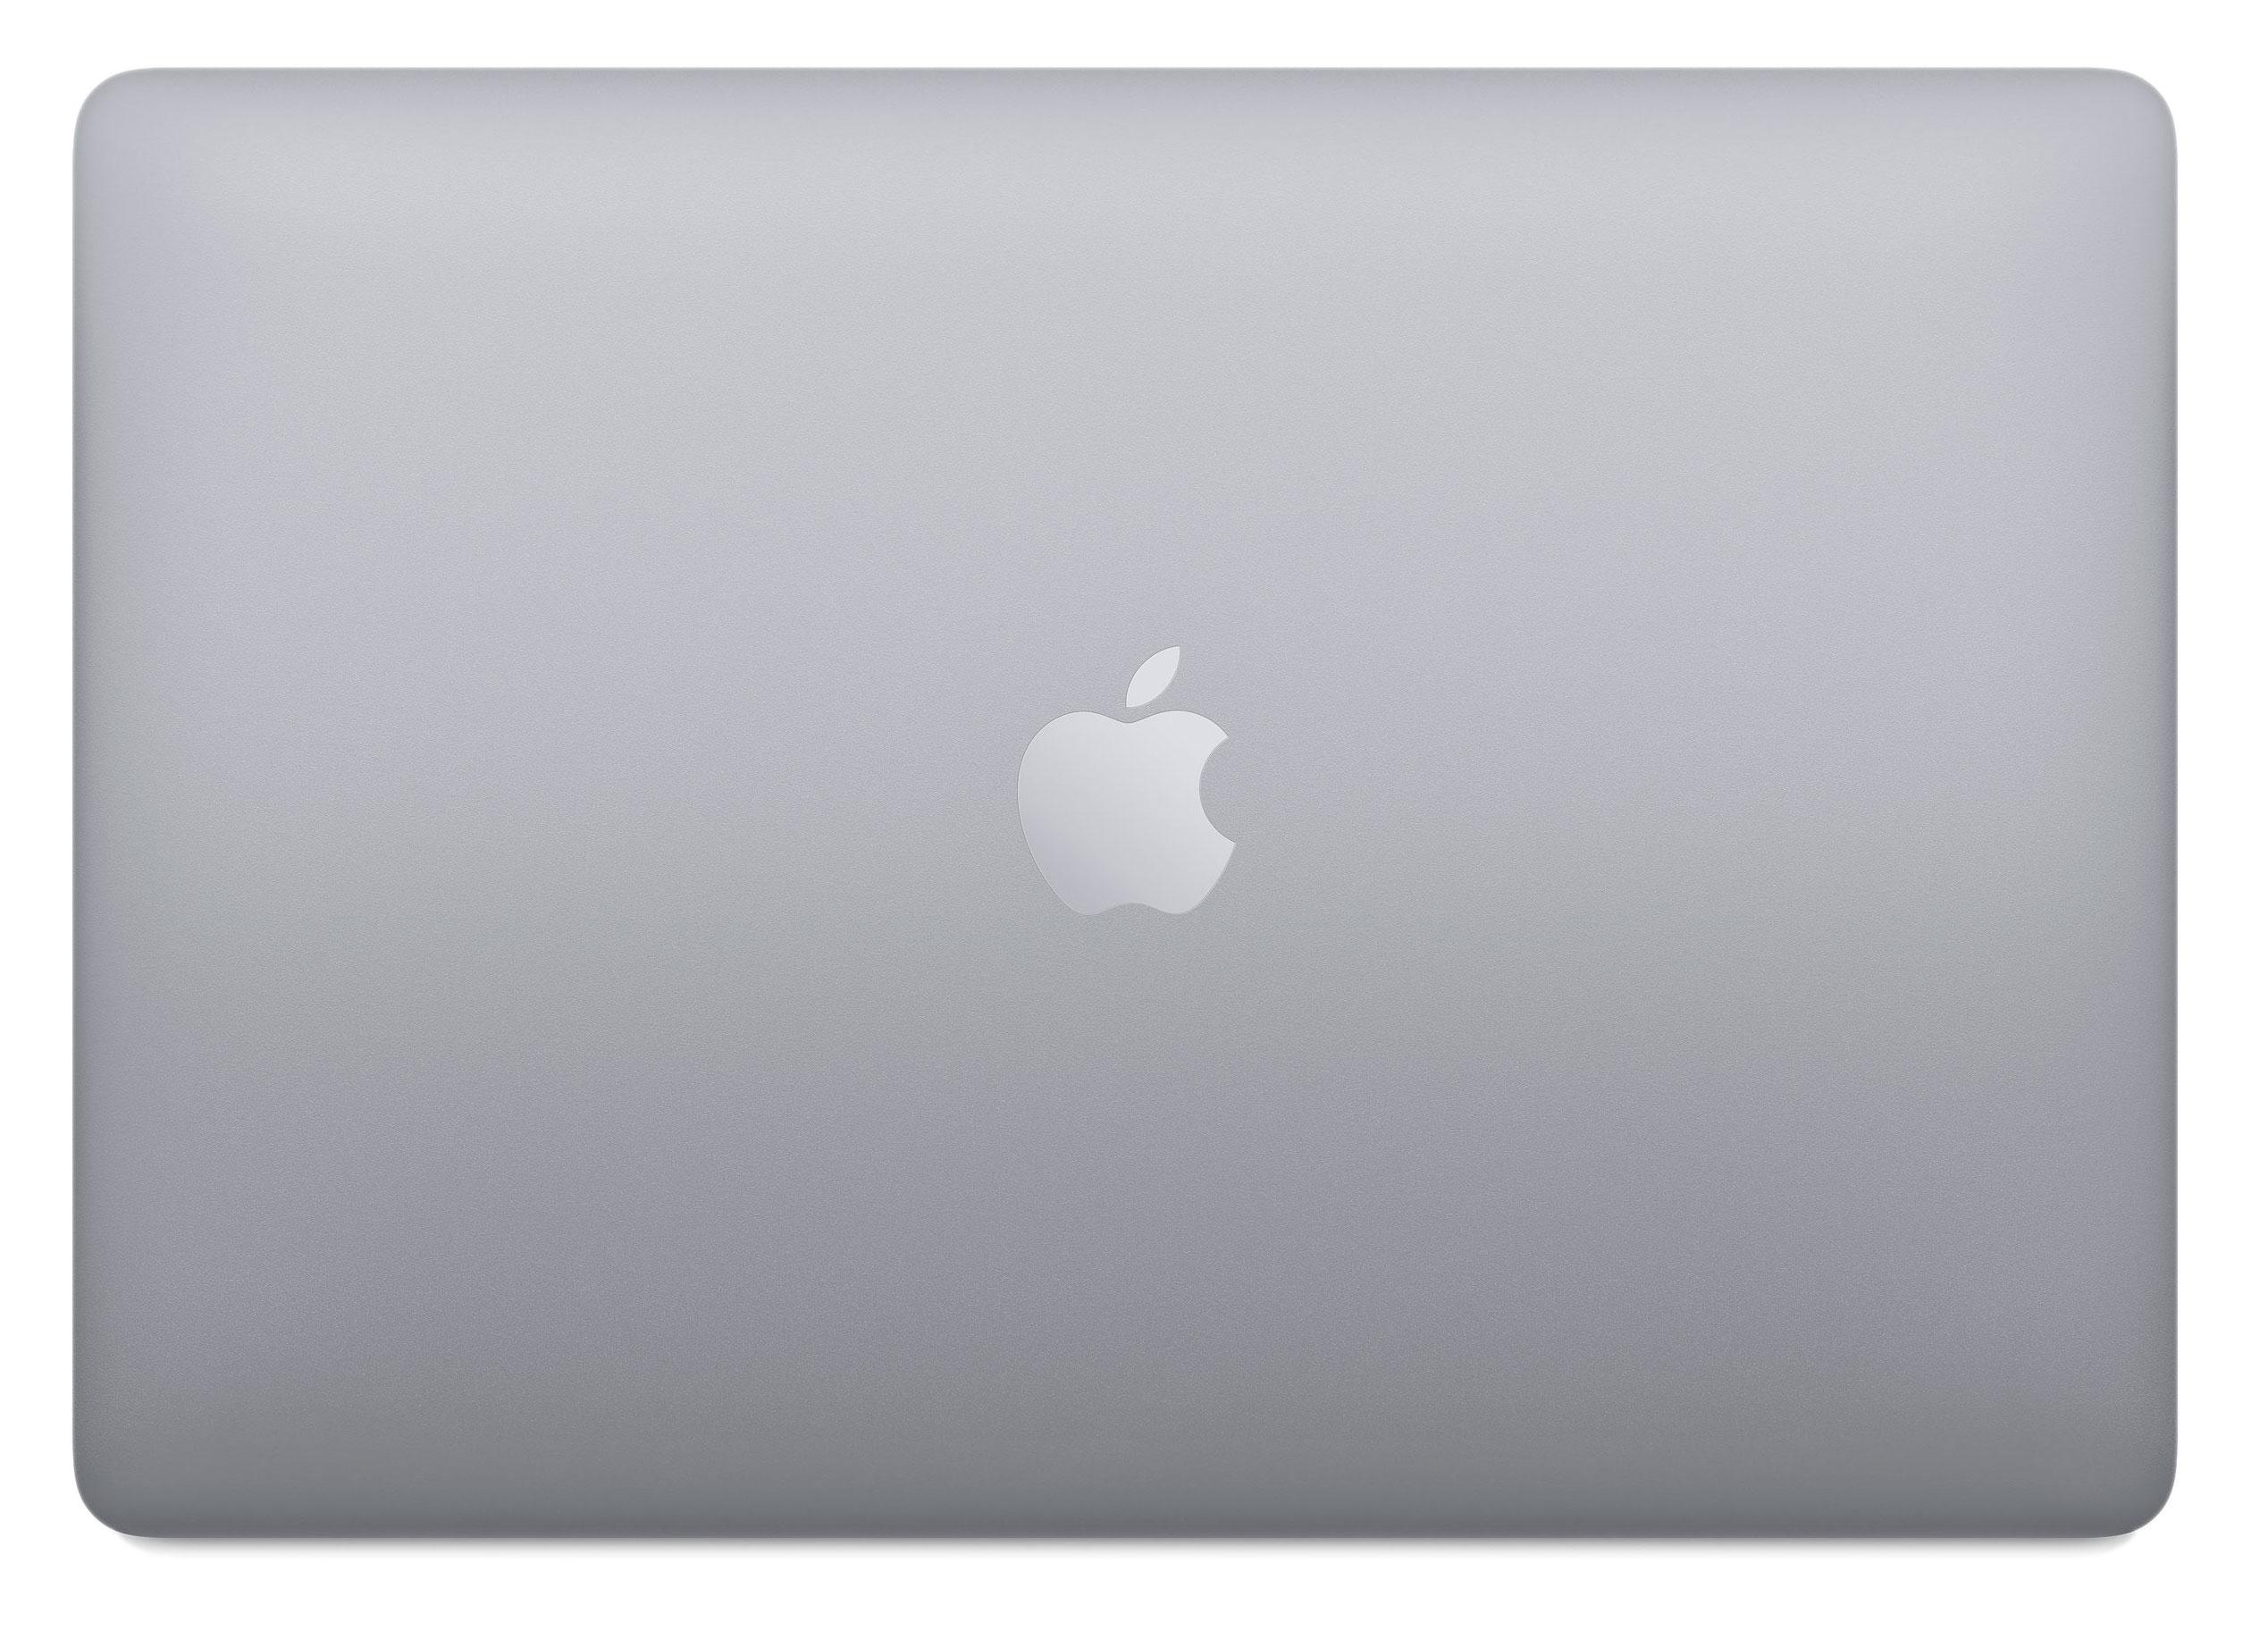 13‑inch MacBook Pro (2020) - Spacegrijs - Intel 2,0‑GHz quad‑coreprocessor - 16 GB RAM - 512 GB SSD - Vier (USB‑C) Thu...